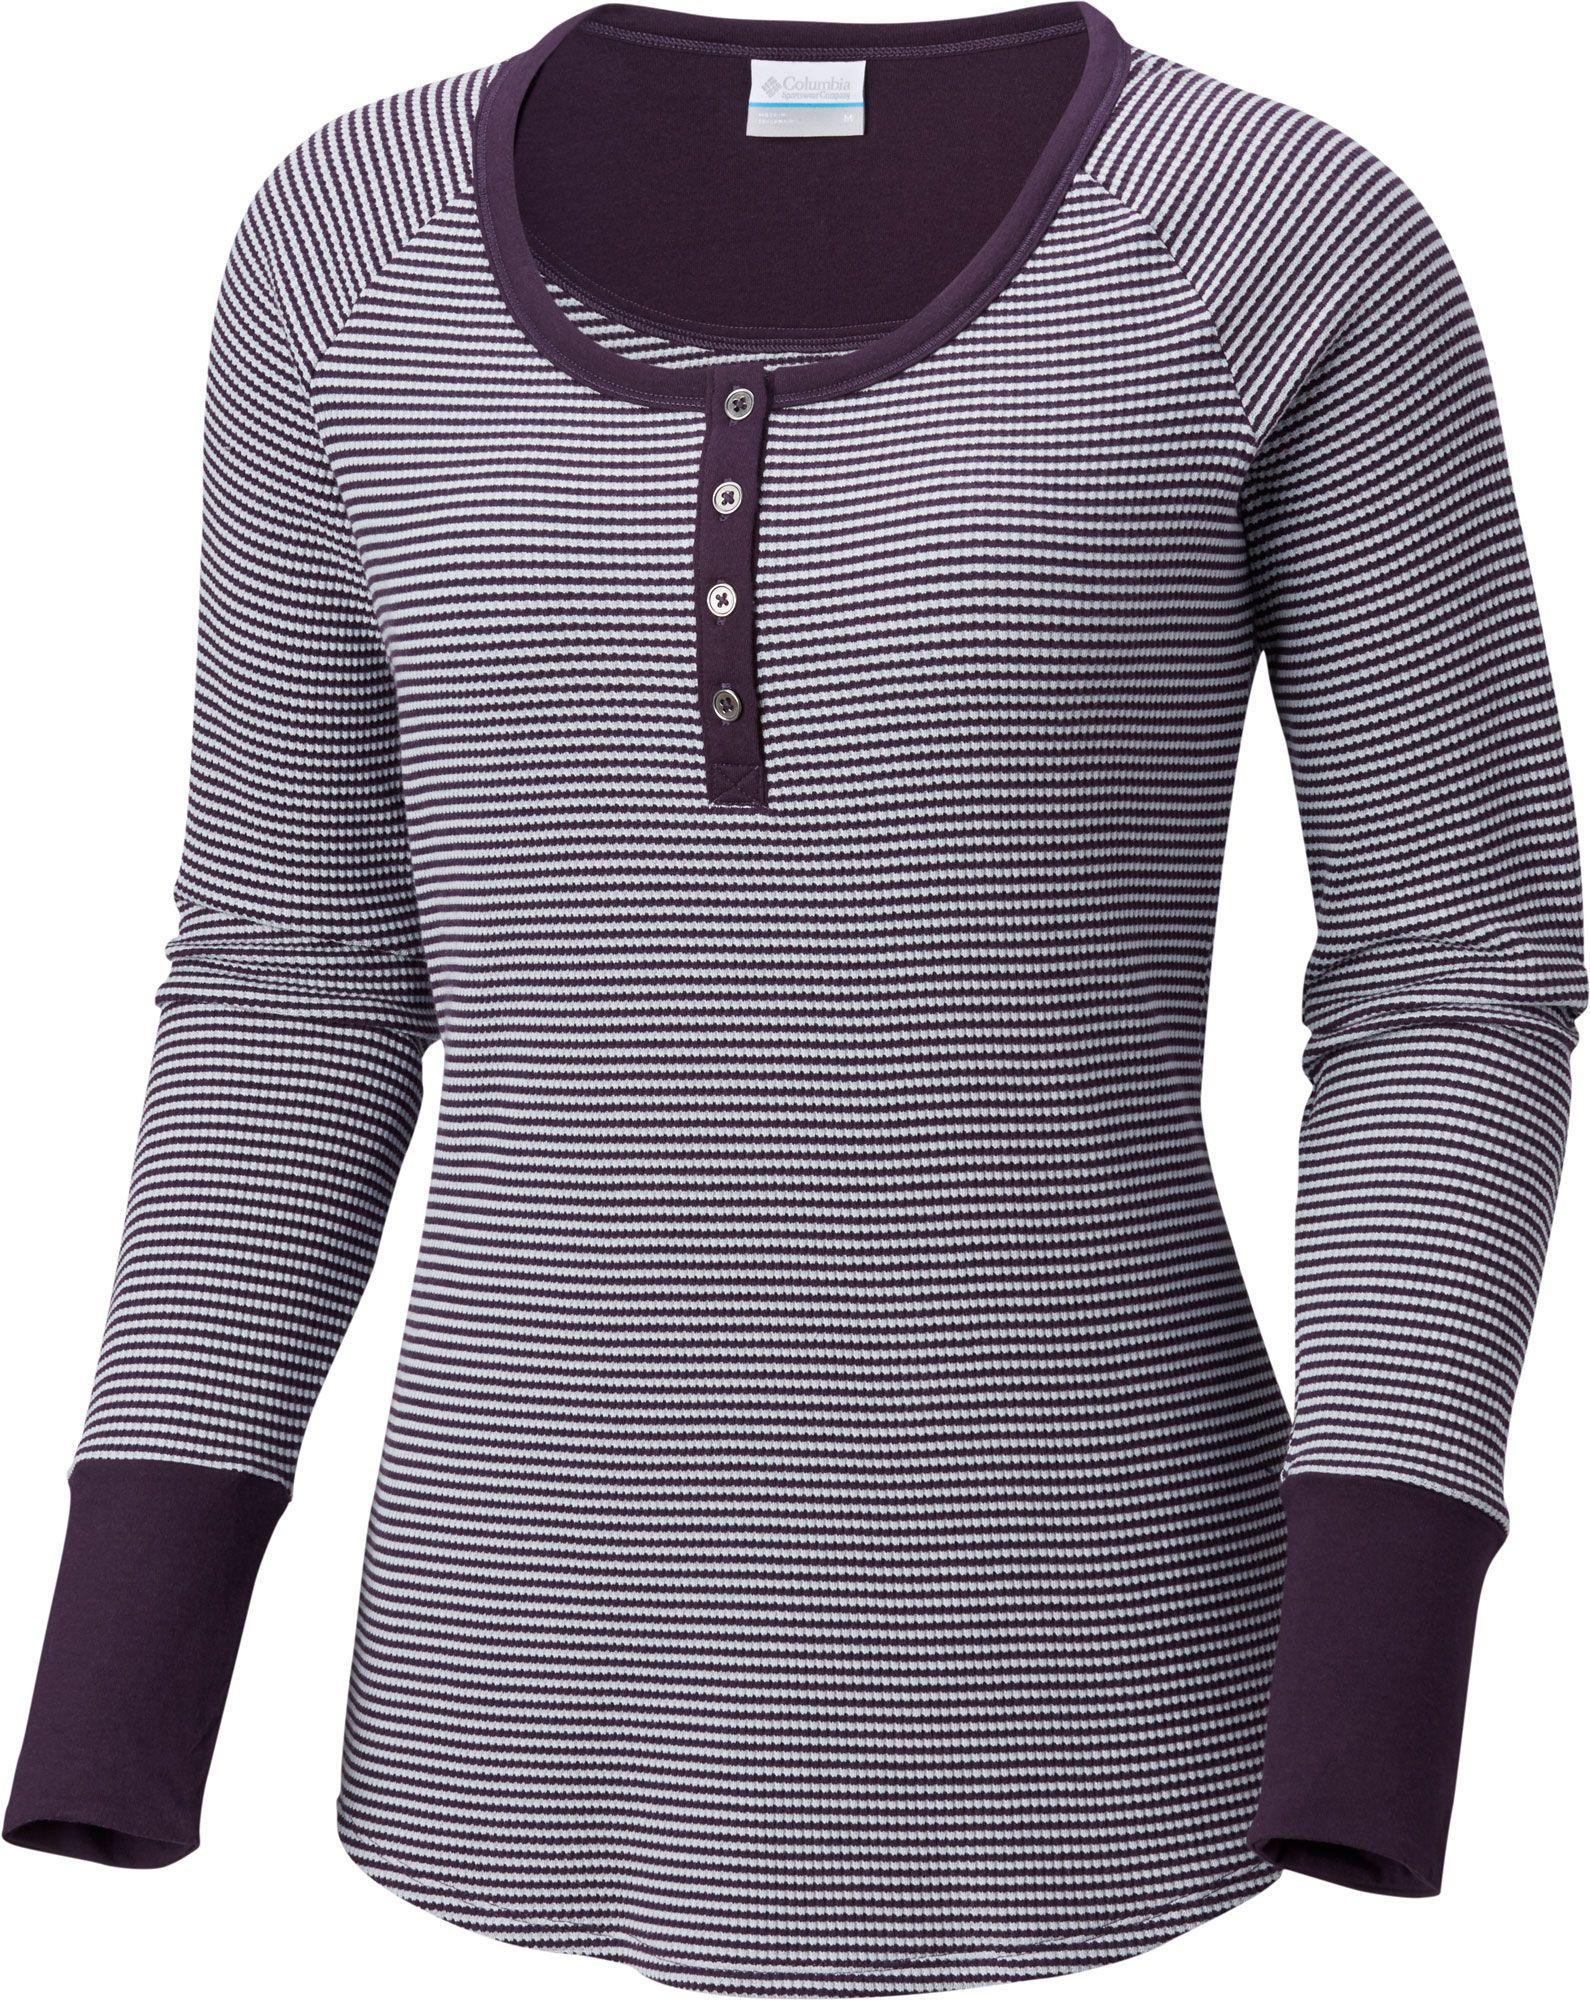 Columbia Women's Along The Gorge Thermal Henley Long Sleeve Shirt, Size: Small, Dark Plum thumbnail